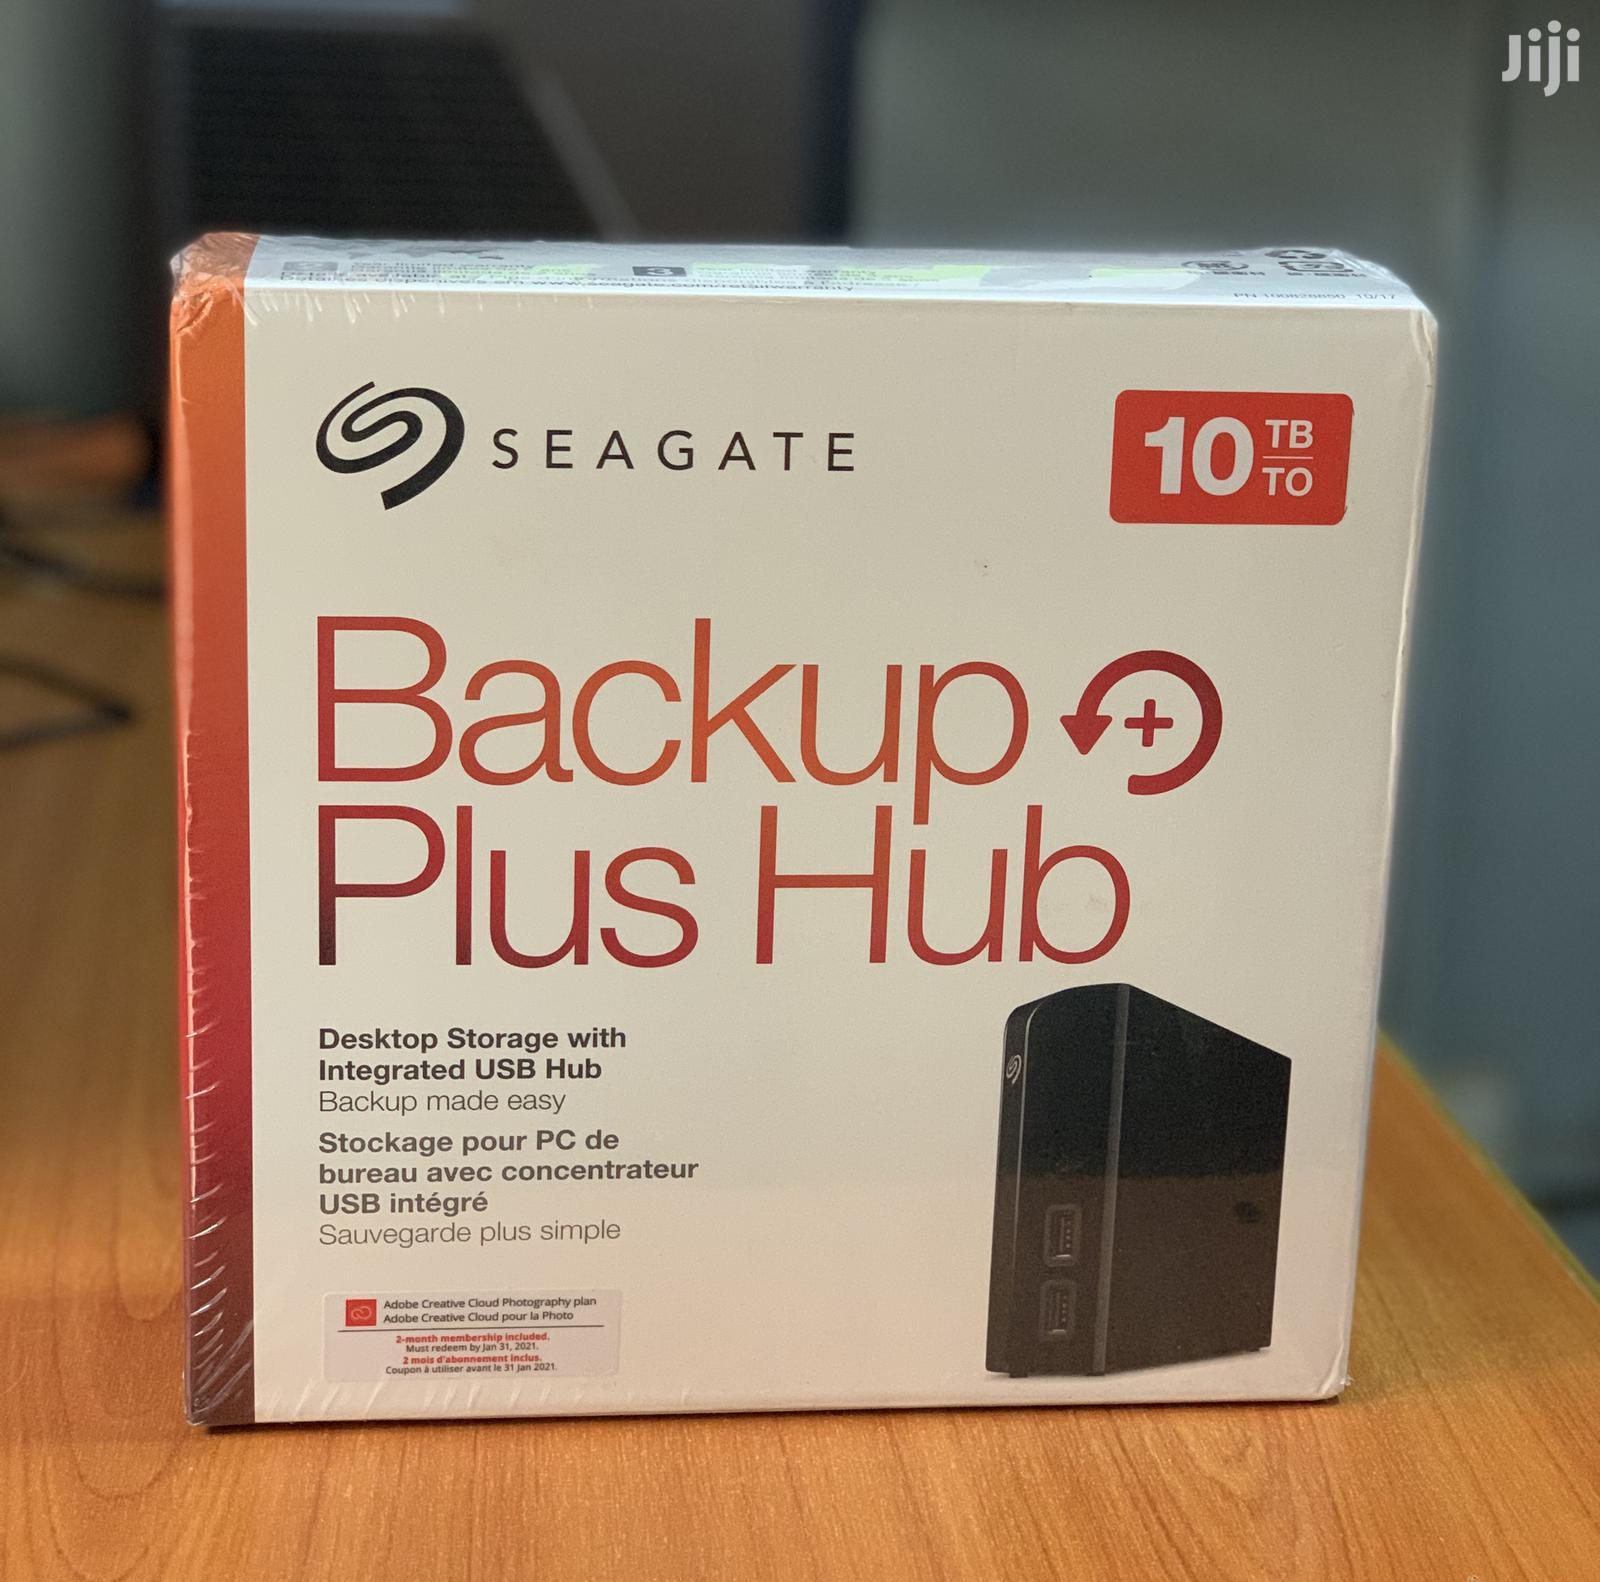 Seagate 10TB Backup Plus Hub | Computer Hardware for sale in Kampala, Central Region, Uganda